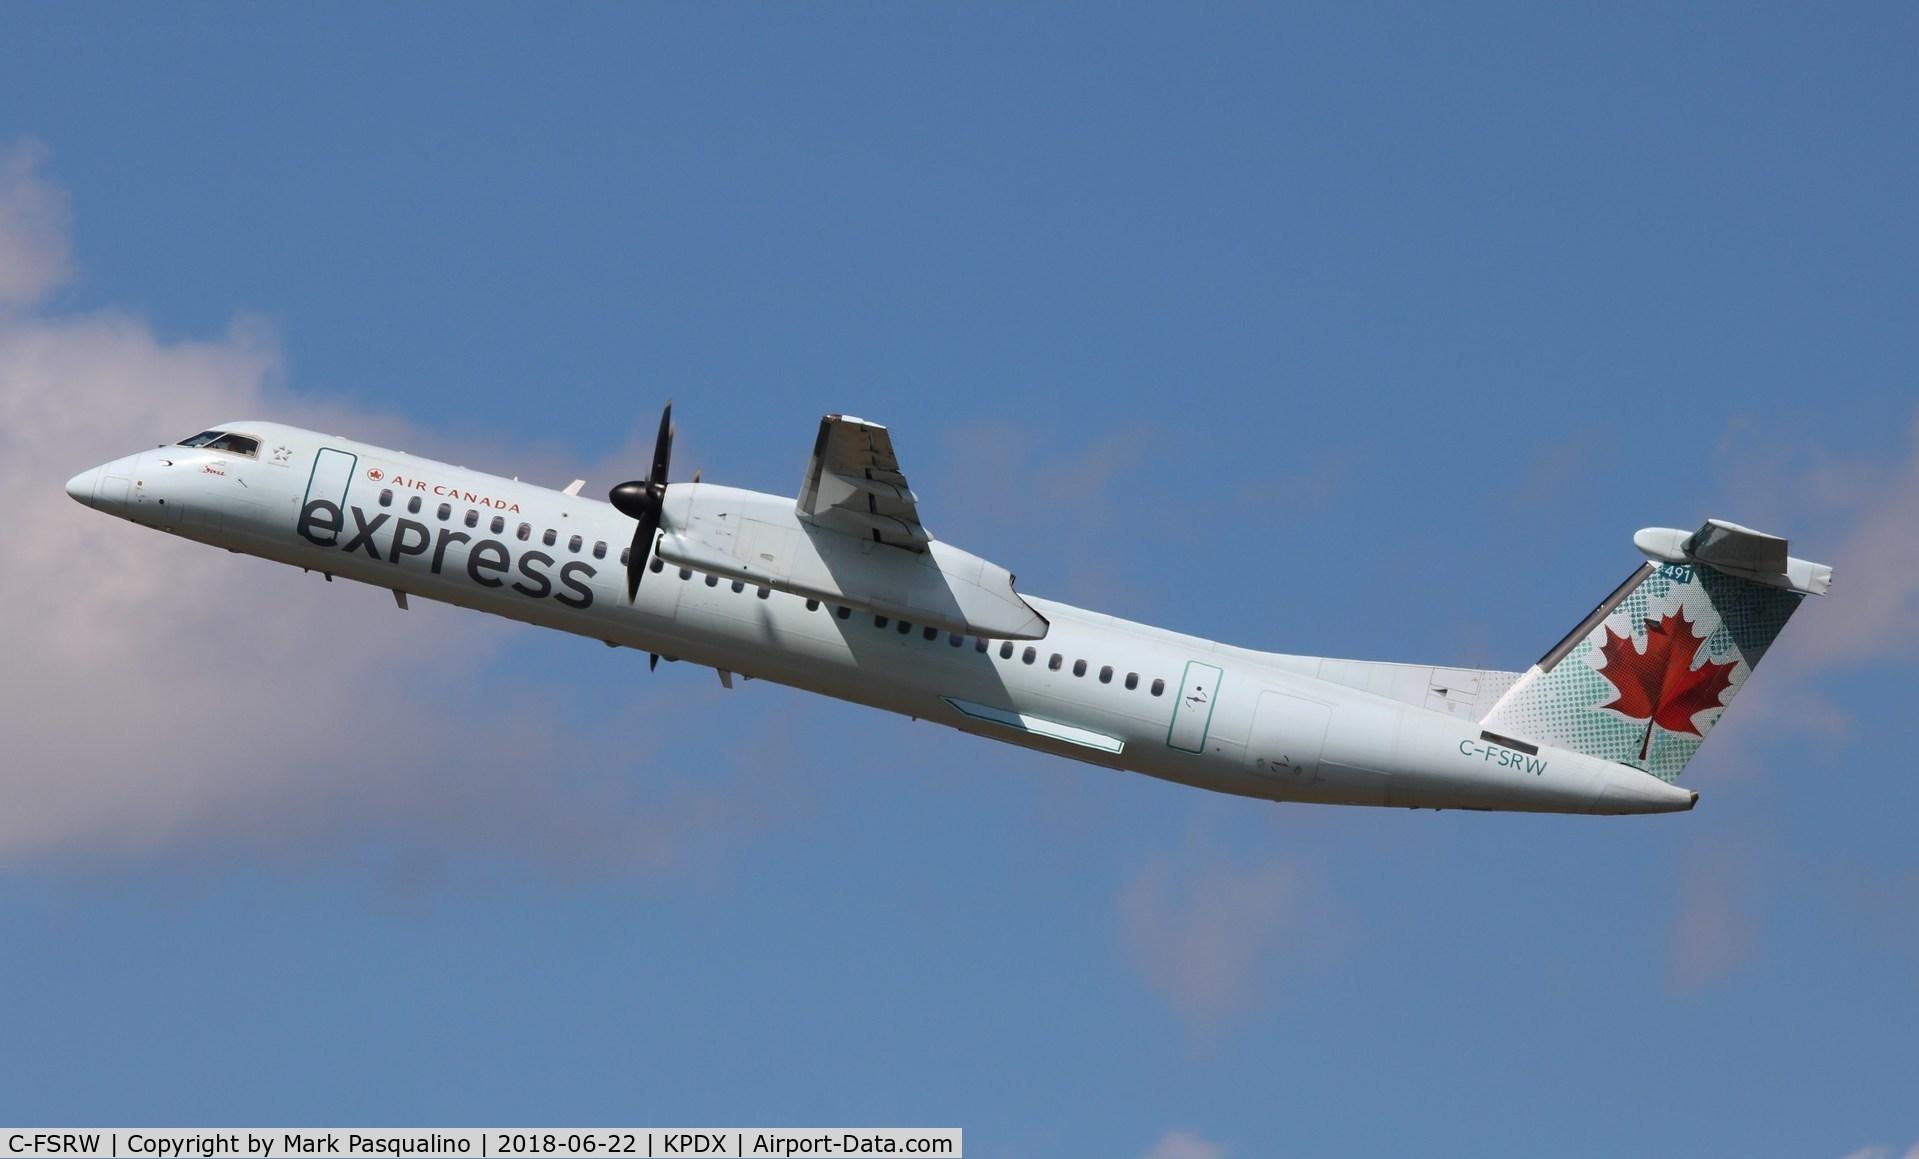 C-FSRW, 2008 De Havilland Canada DHC-8-402Q Dash 8 C/N 4221, DHC-8-402